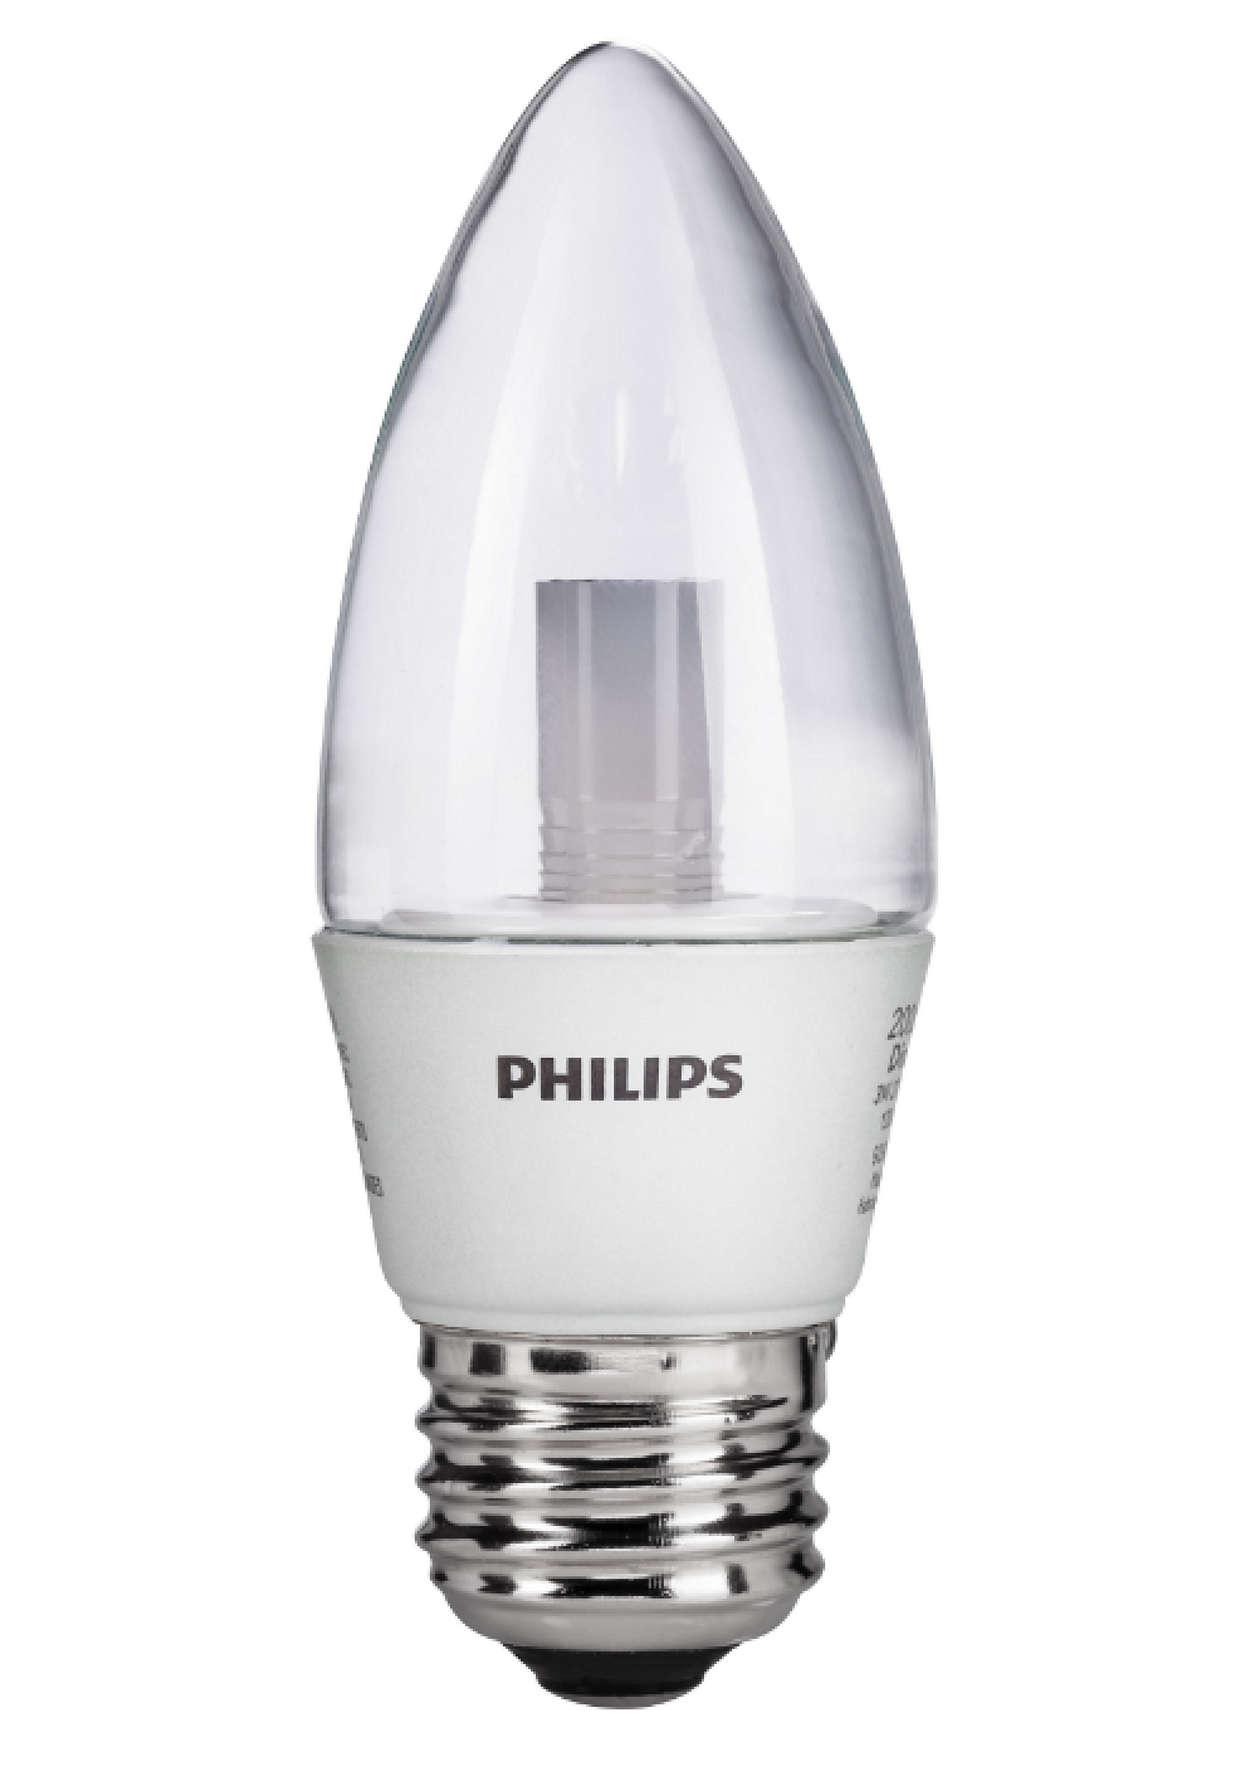 Philips, Blunt Tip Decorative Candle LED Bulb - 046677421021 - Nova ...